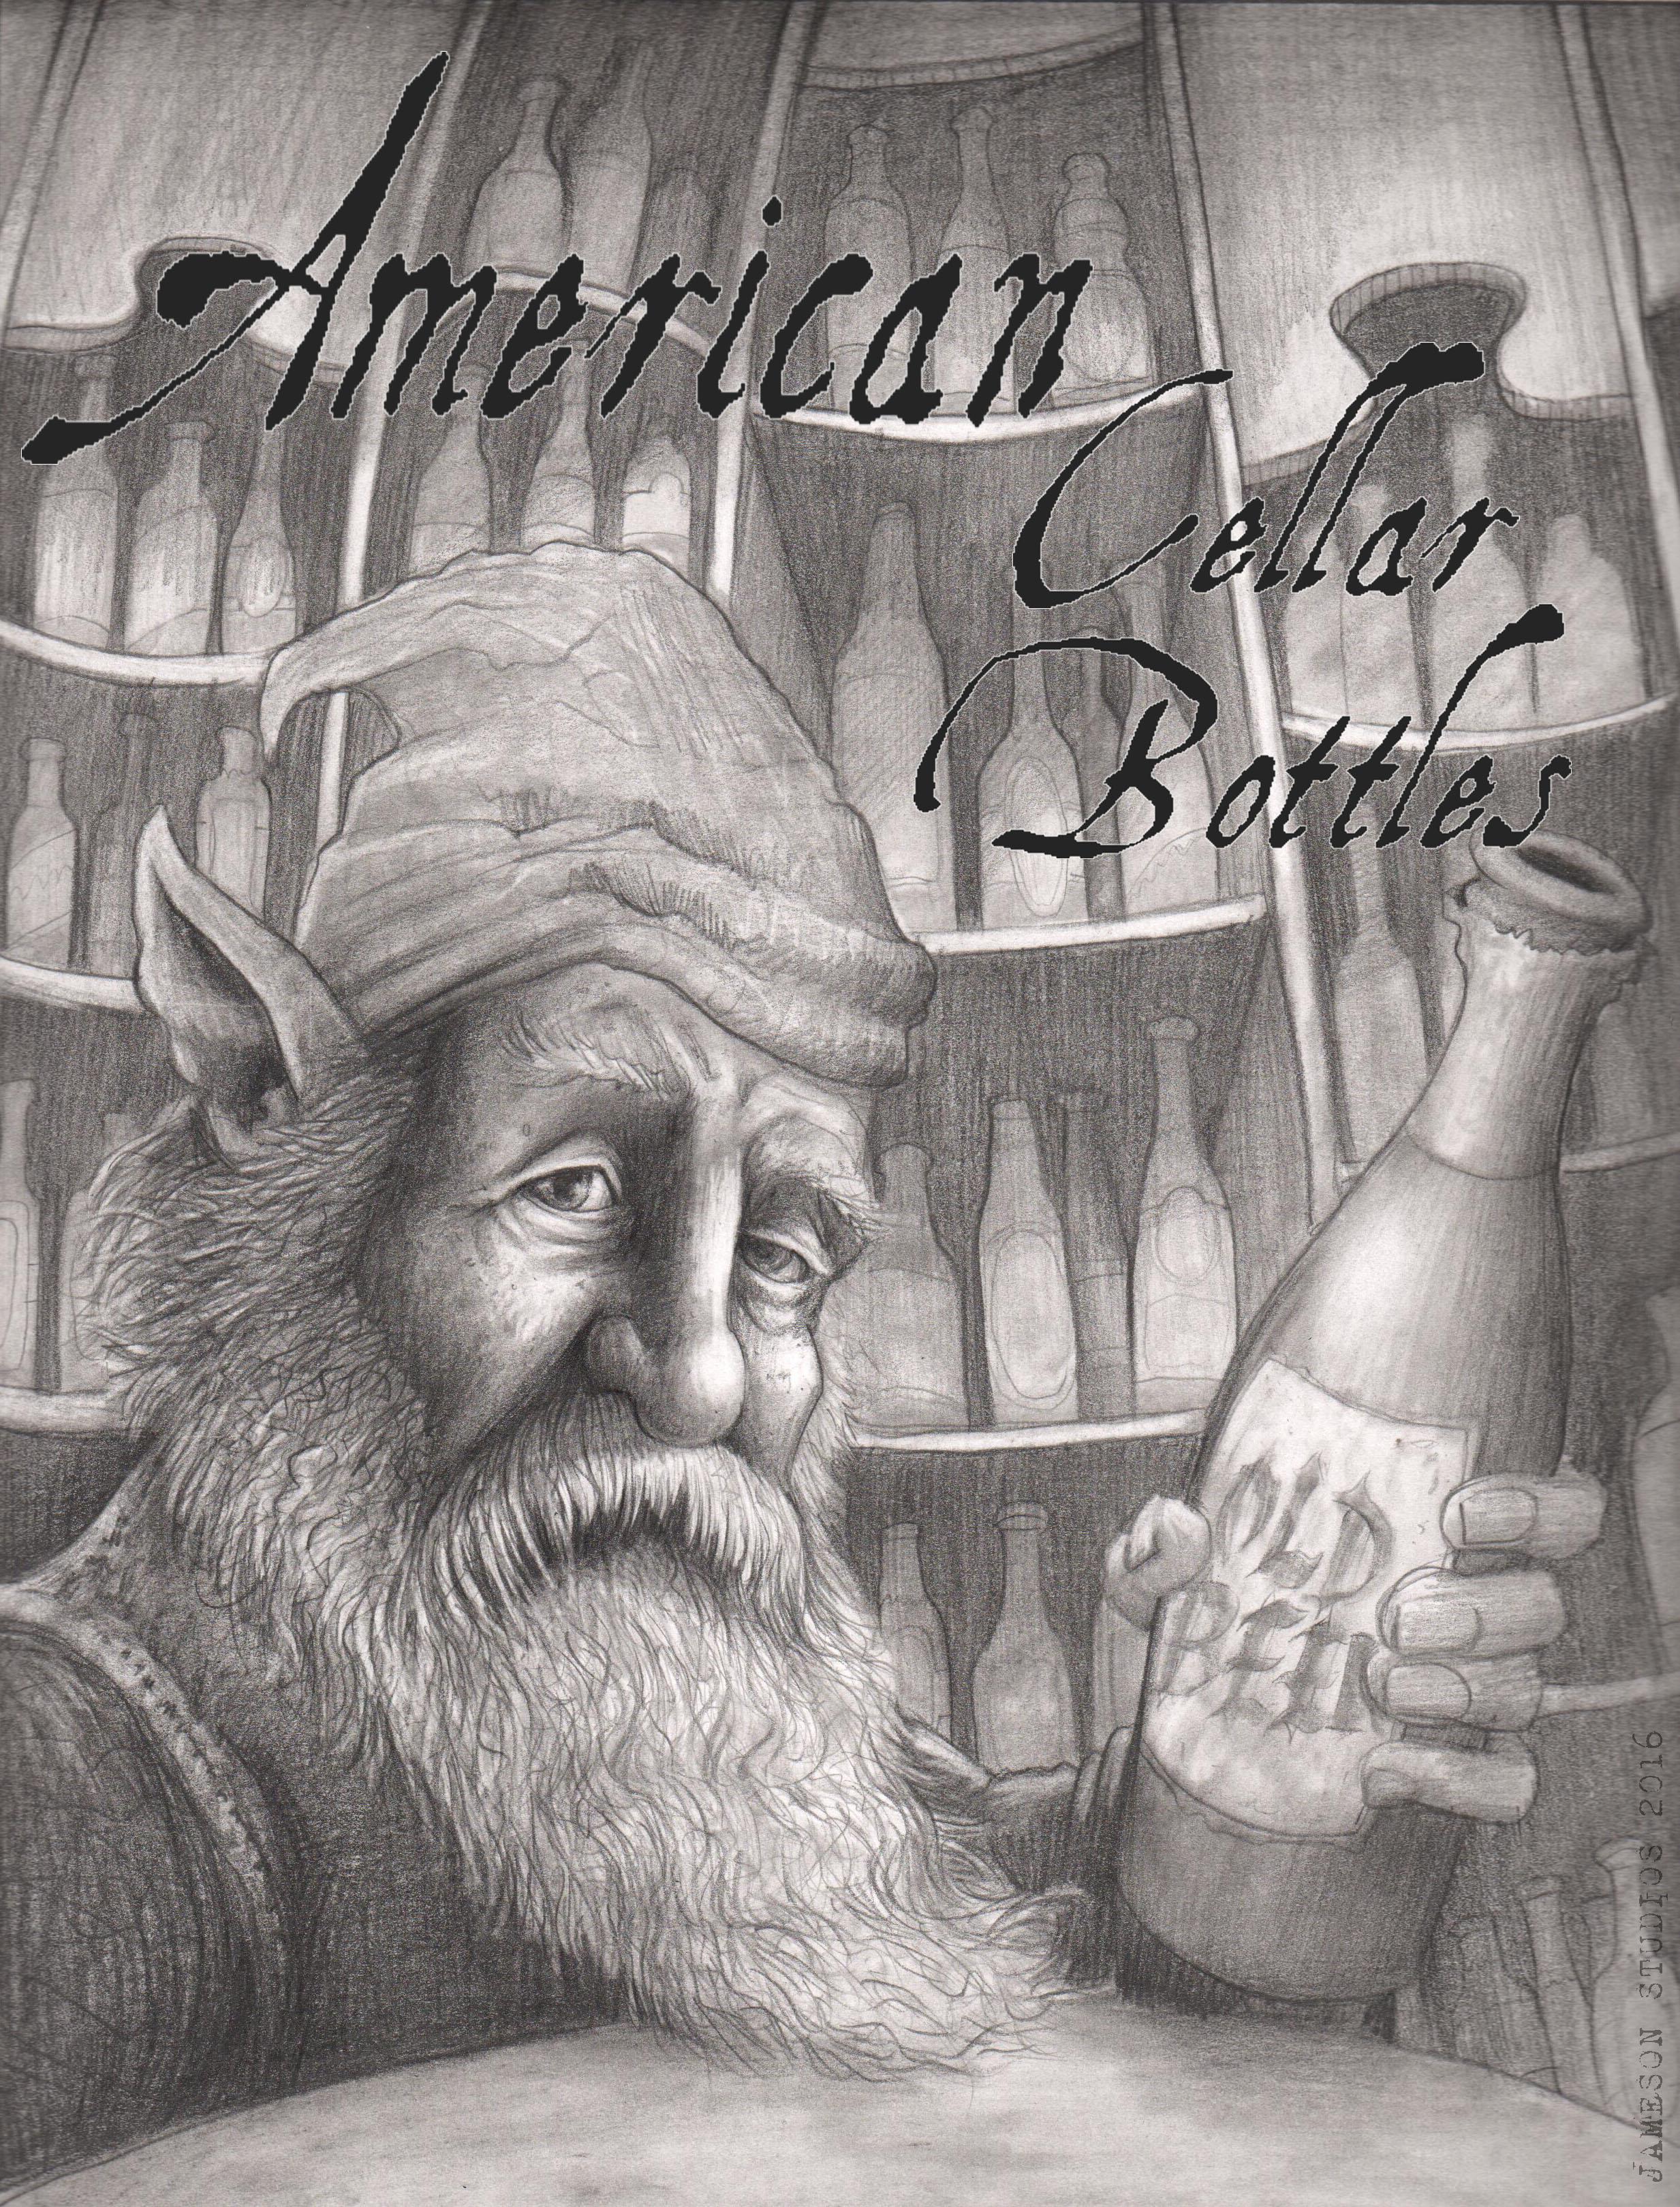 BSP_american cellar bottles_cellar page.jpg